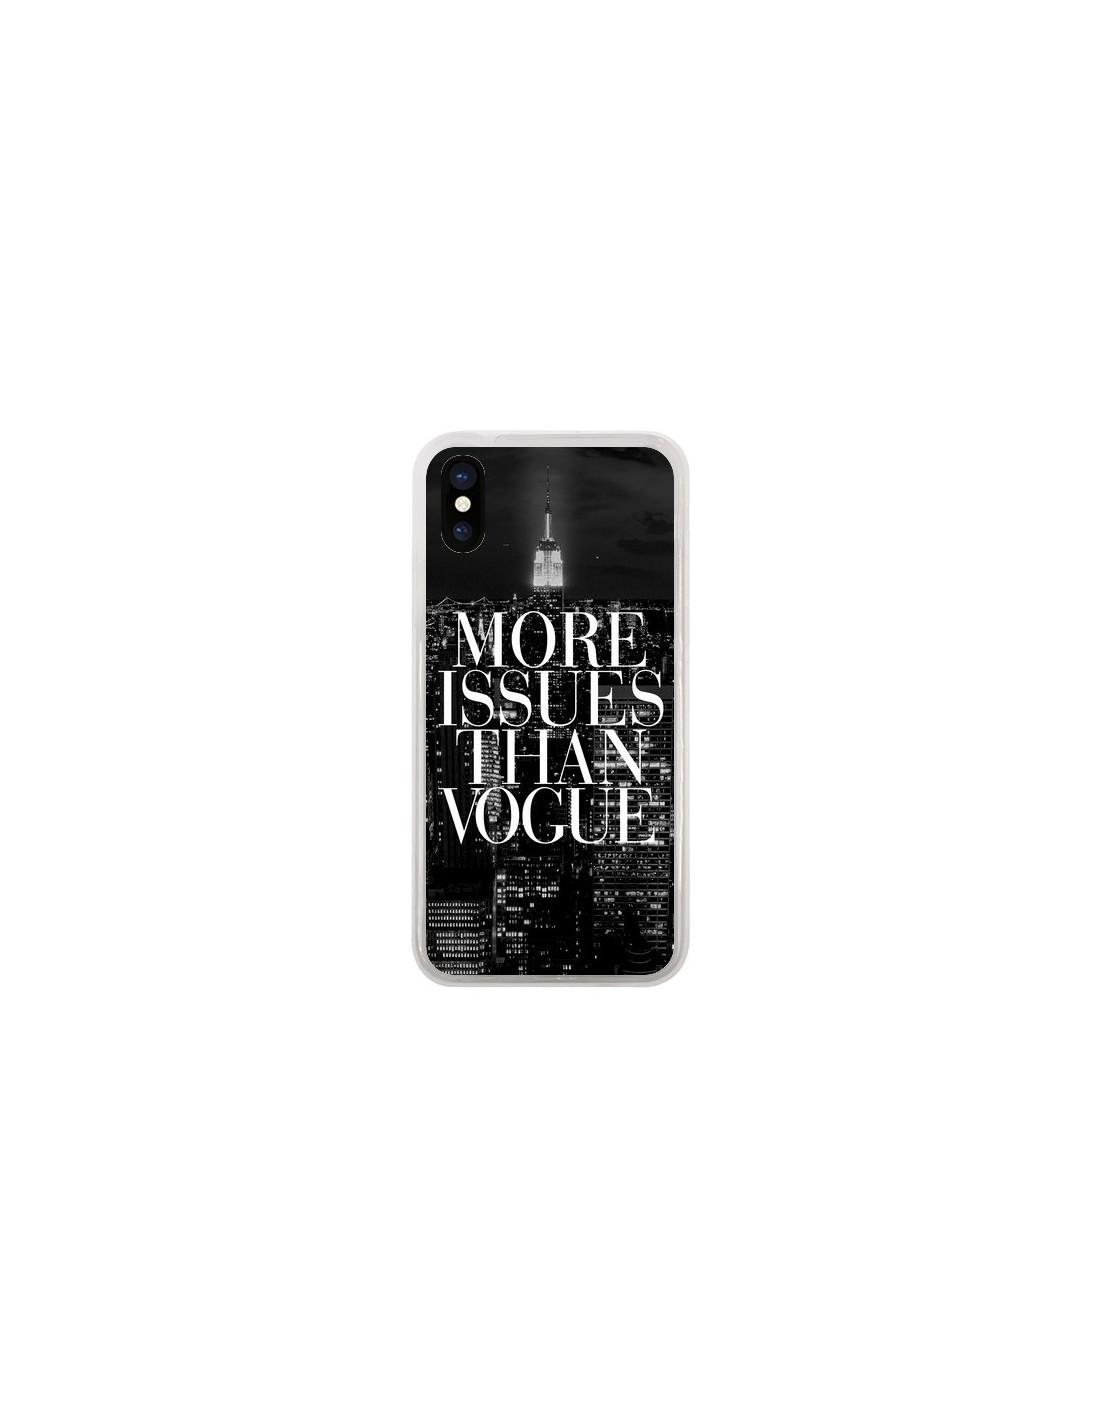 Coque Iphone  Vogue